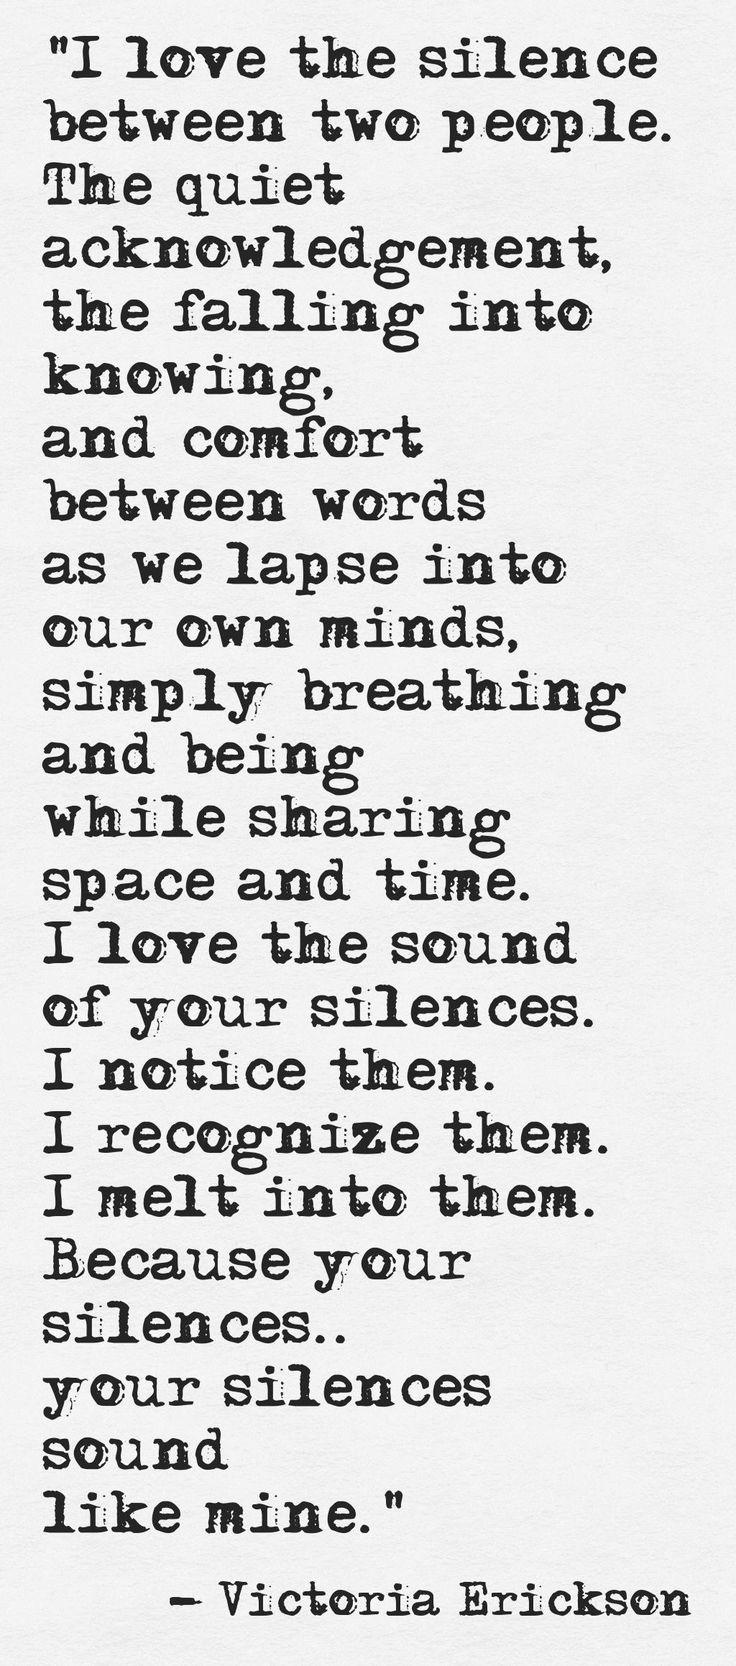 Love Victoria Erickson - she speaks to my soul...